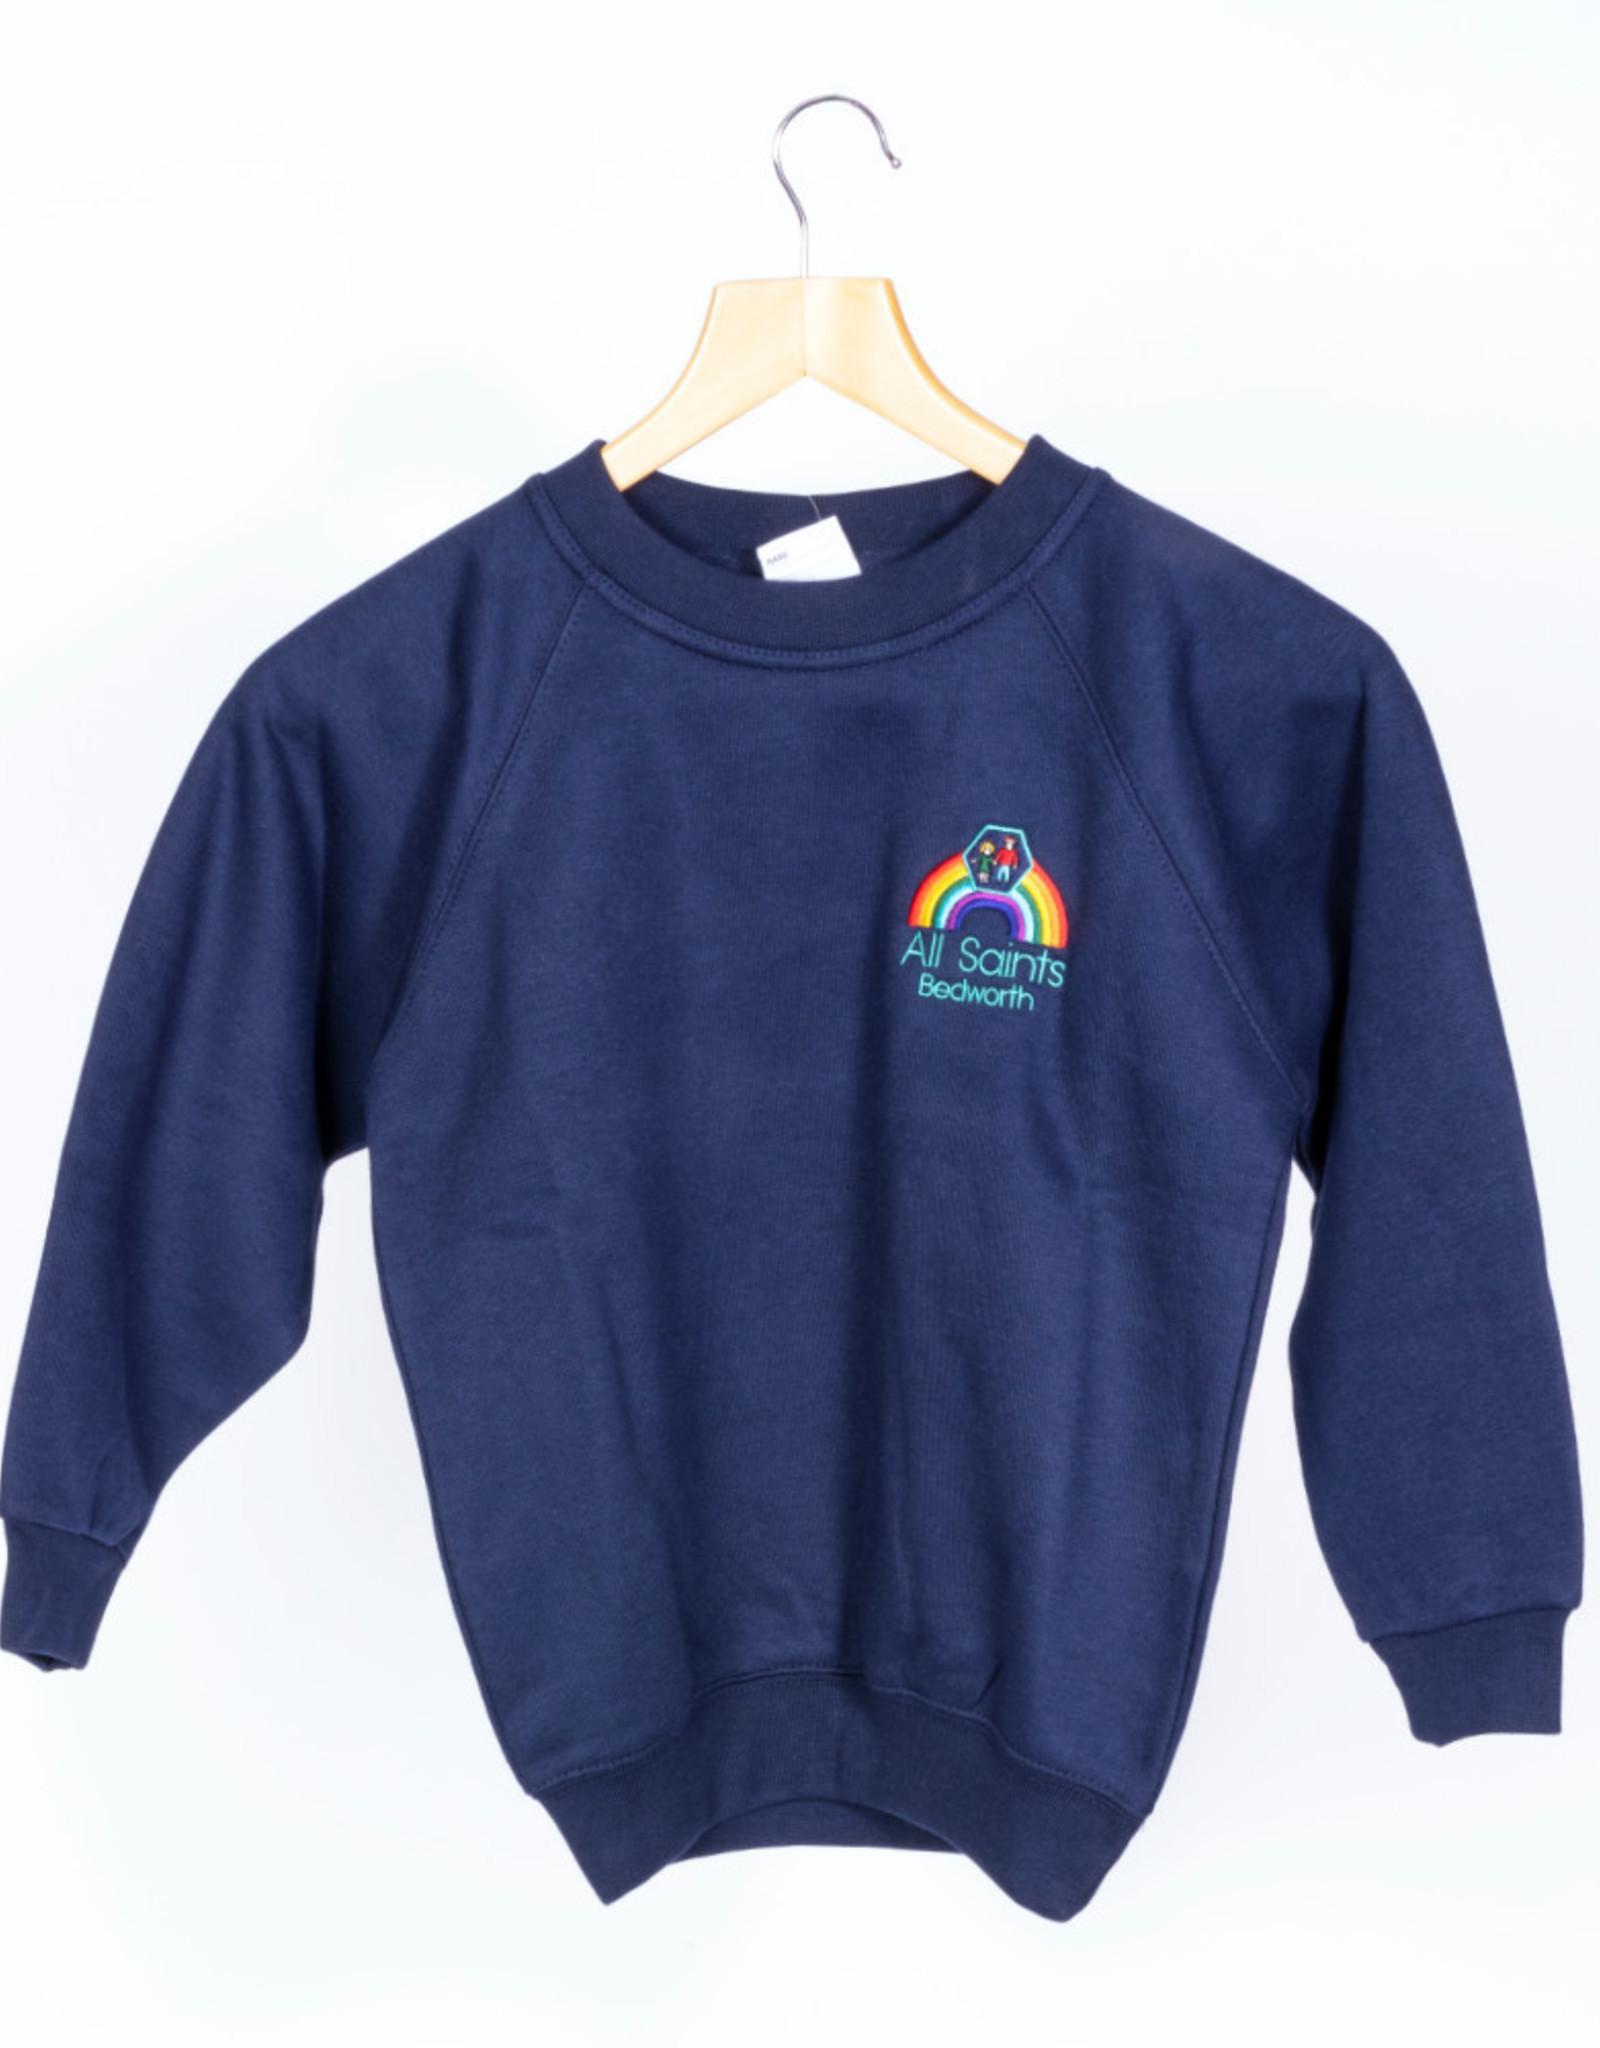 Round-Neck Sweatshirt Adult Size - All Saints